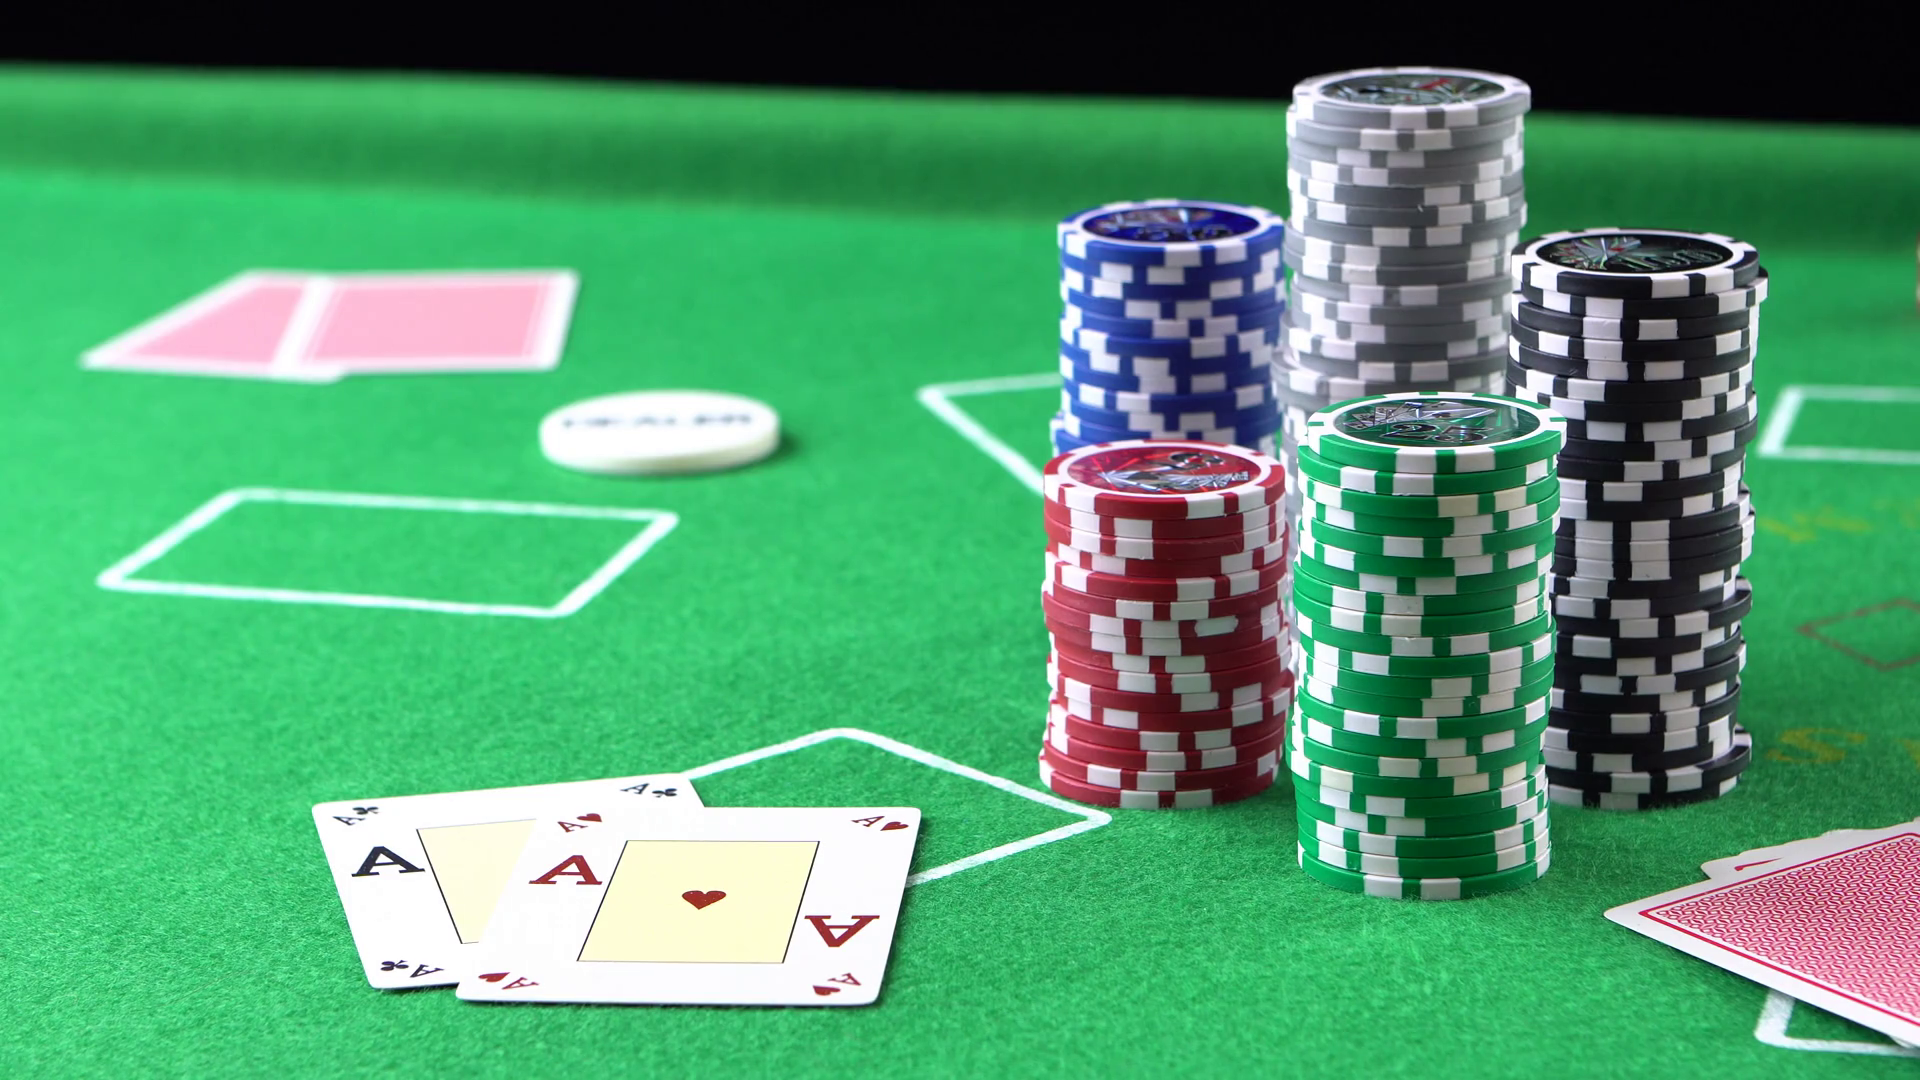 Permainan situs kasino – Ulasan tentang Swiss Casino